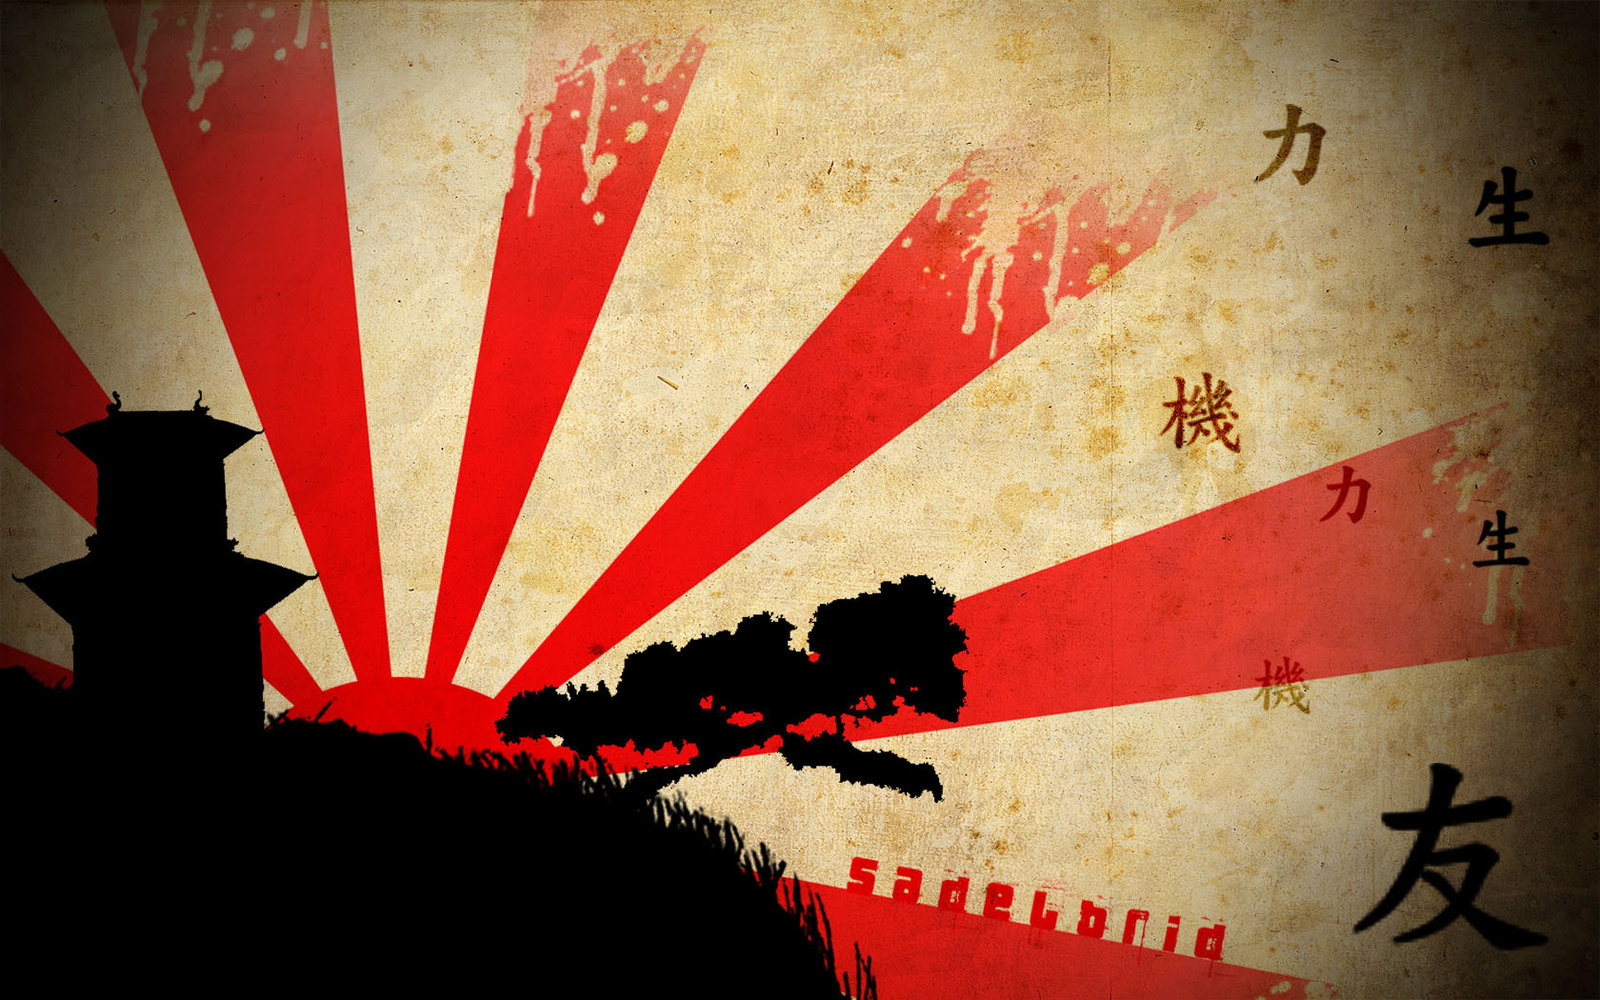 http://4.bp.blogspot.com/-lP9nRPYfkaQ/Tg-DWPpuH2I/AAAAAAAAGCU/sMLRN_Azguo/s1600/japanese%2Bwallpaper-1.jpg